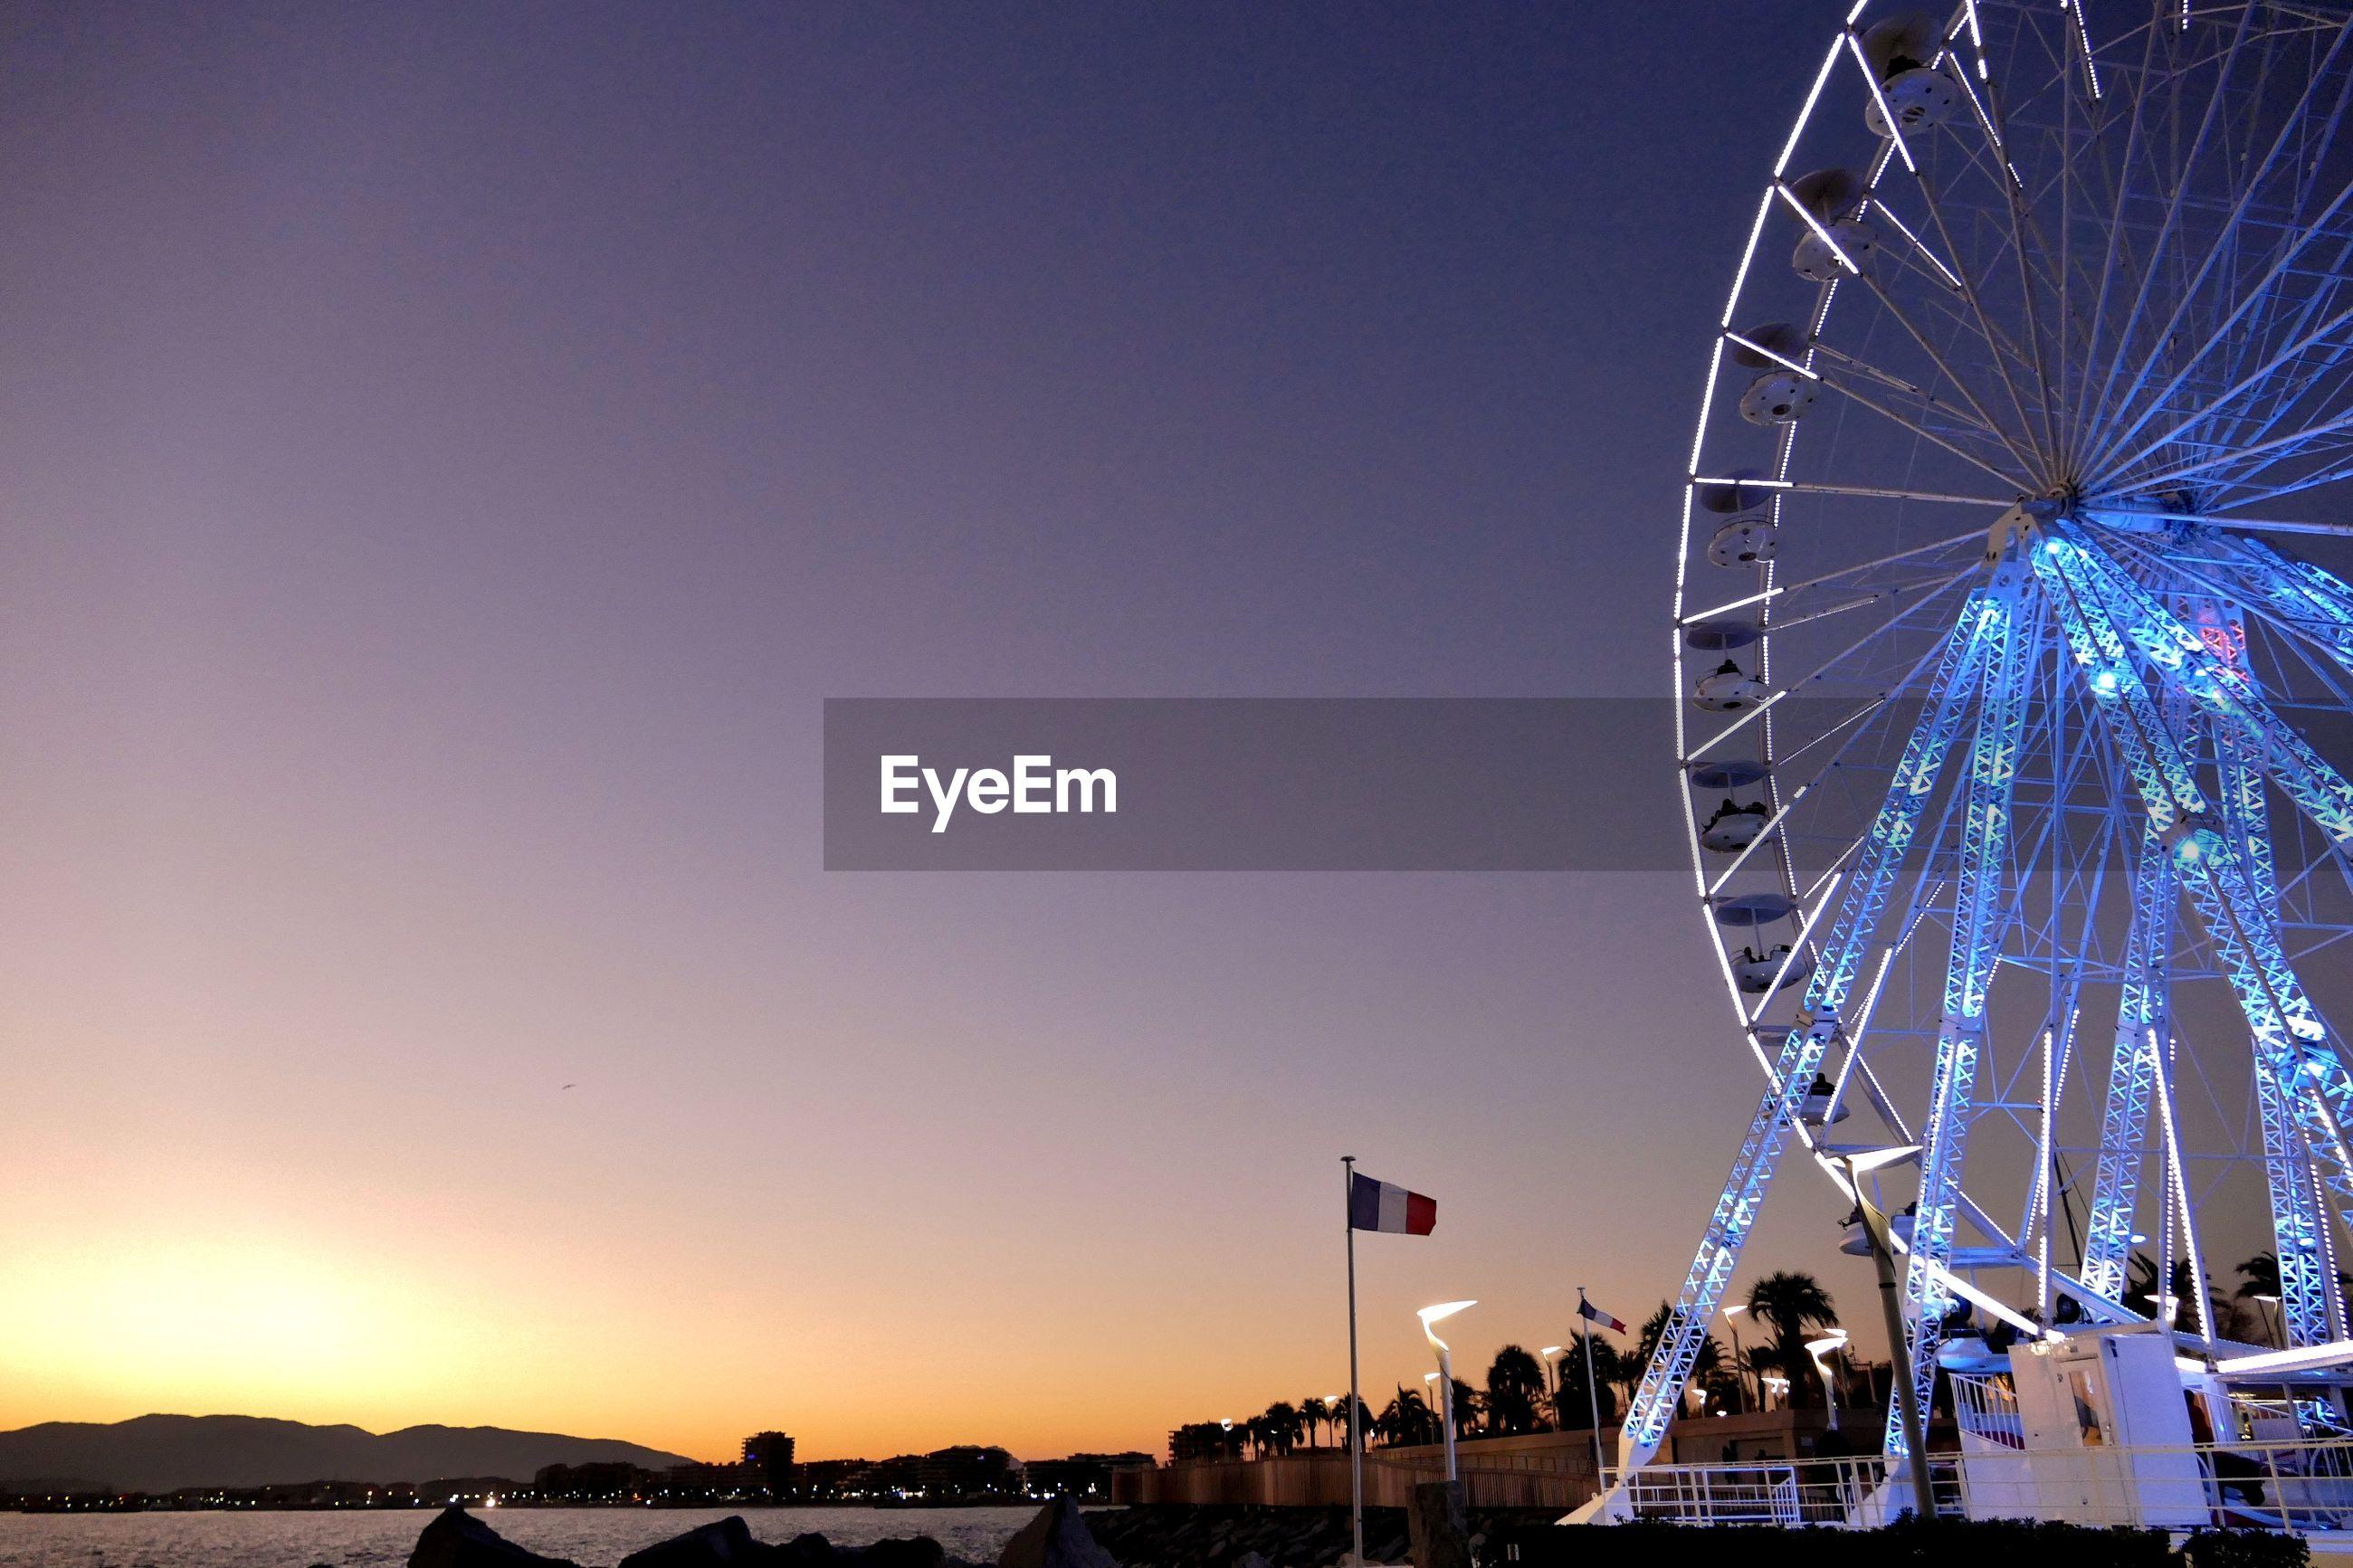 Illuminated ferris wheel against clear sky at sunset